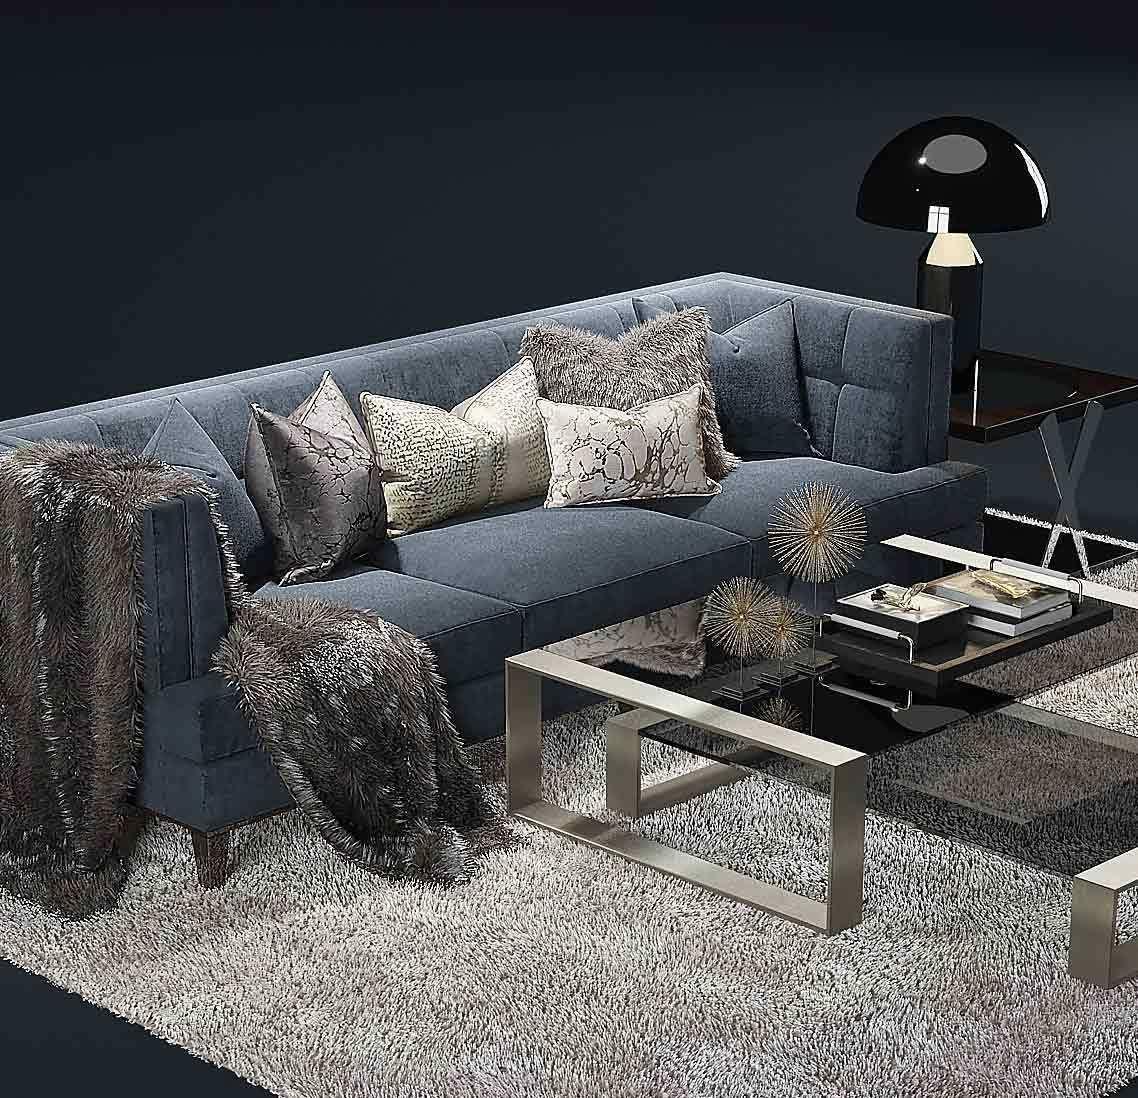 The Sofa And Chair Company Preston Hirst Table Model Max Obj